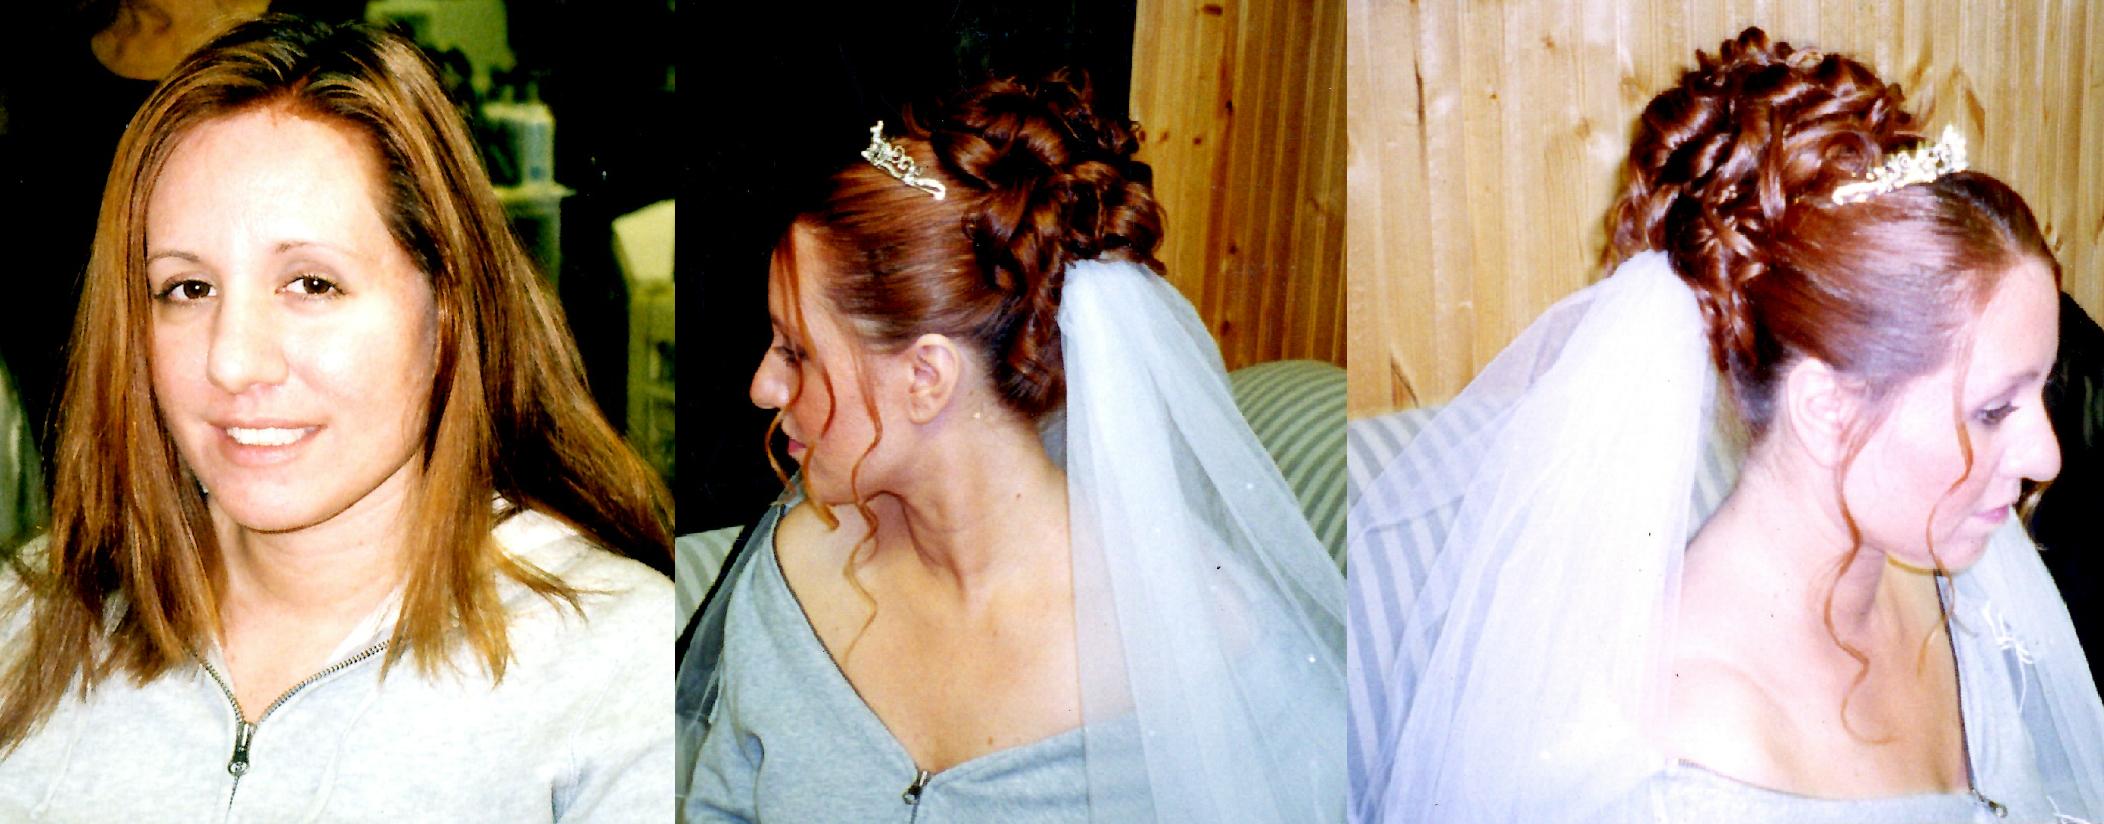 bride 6.png